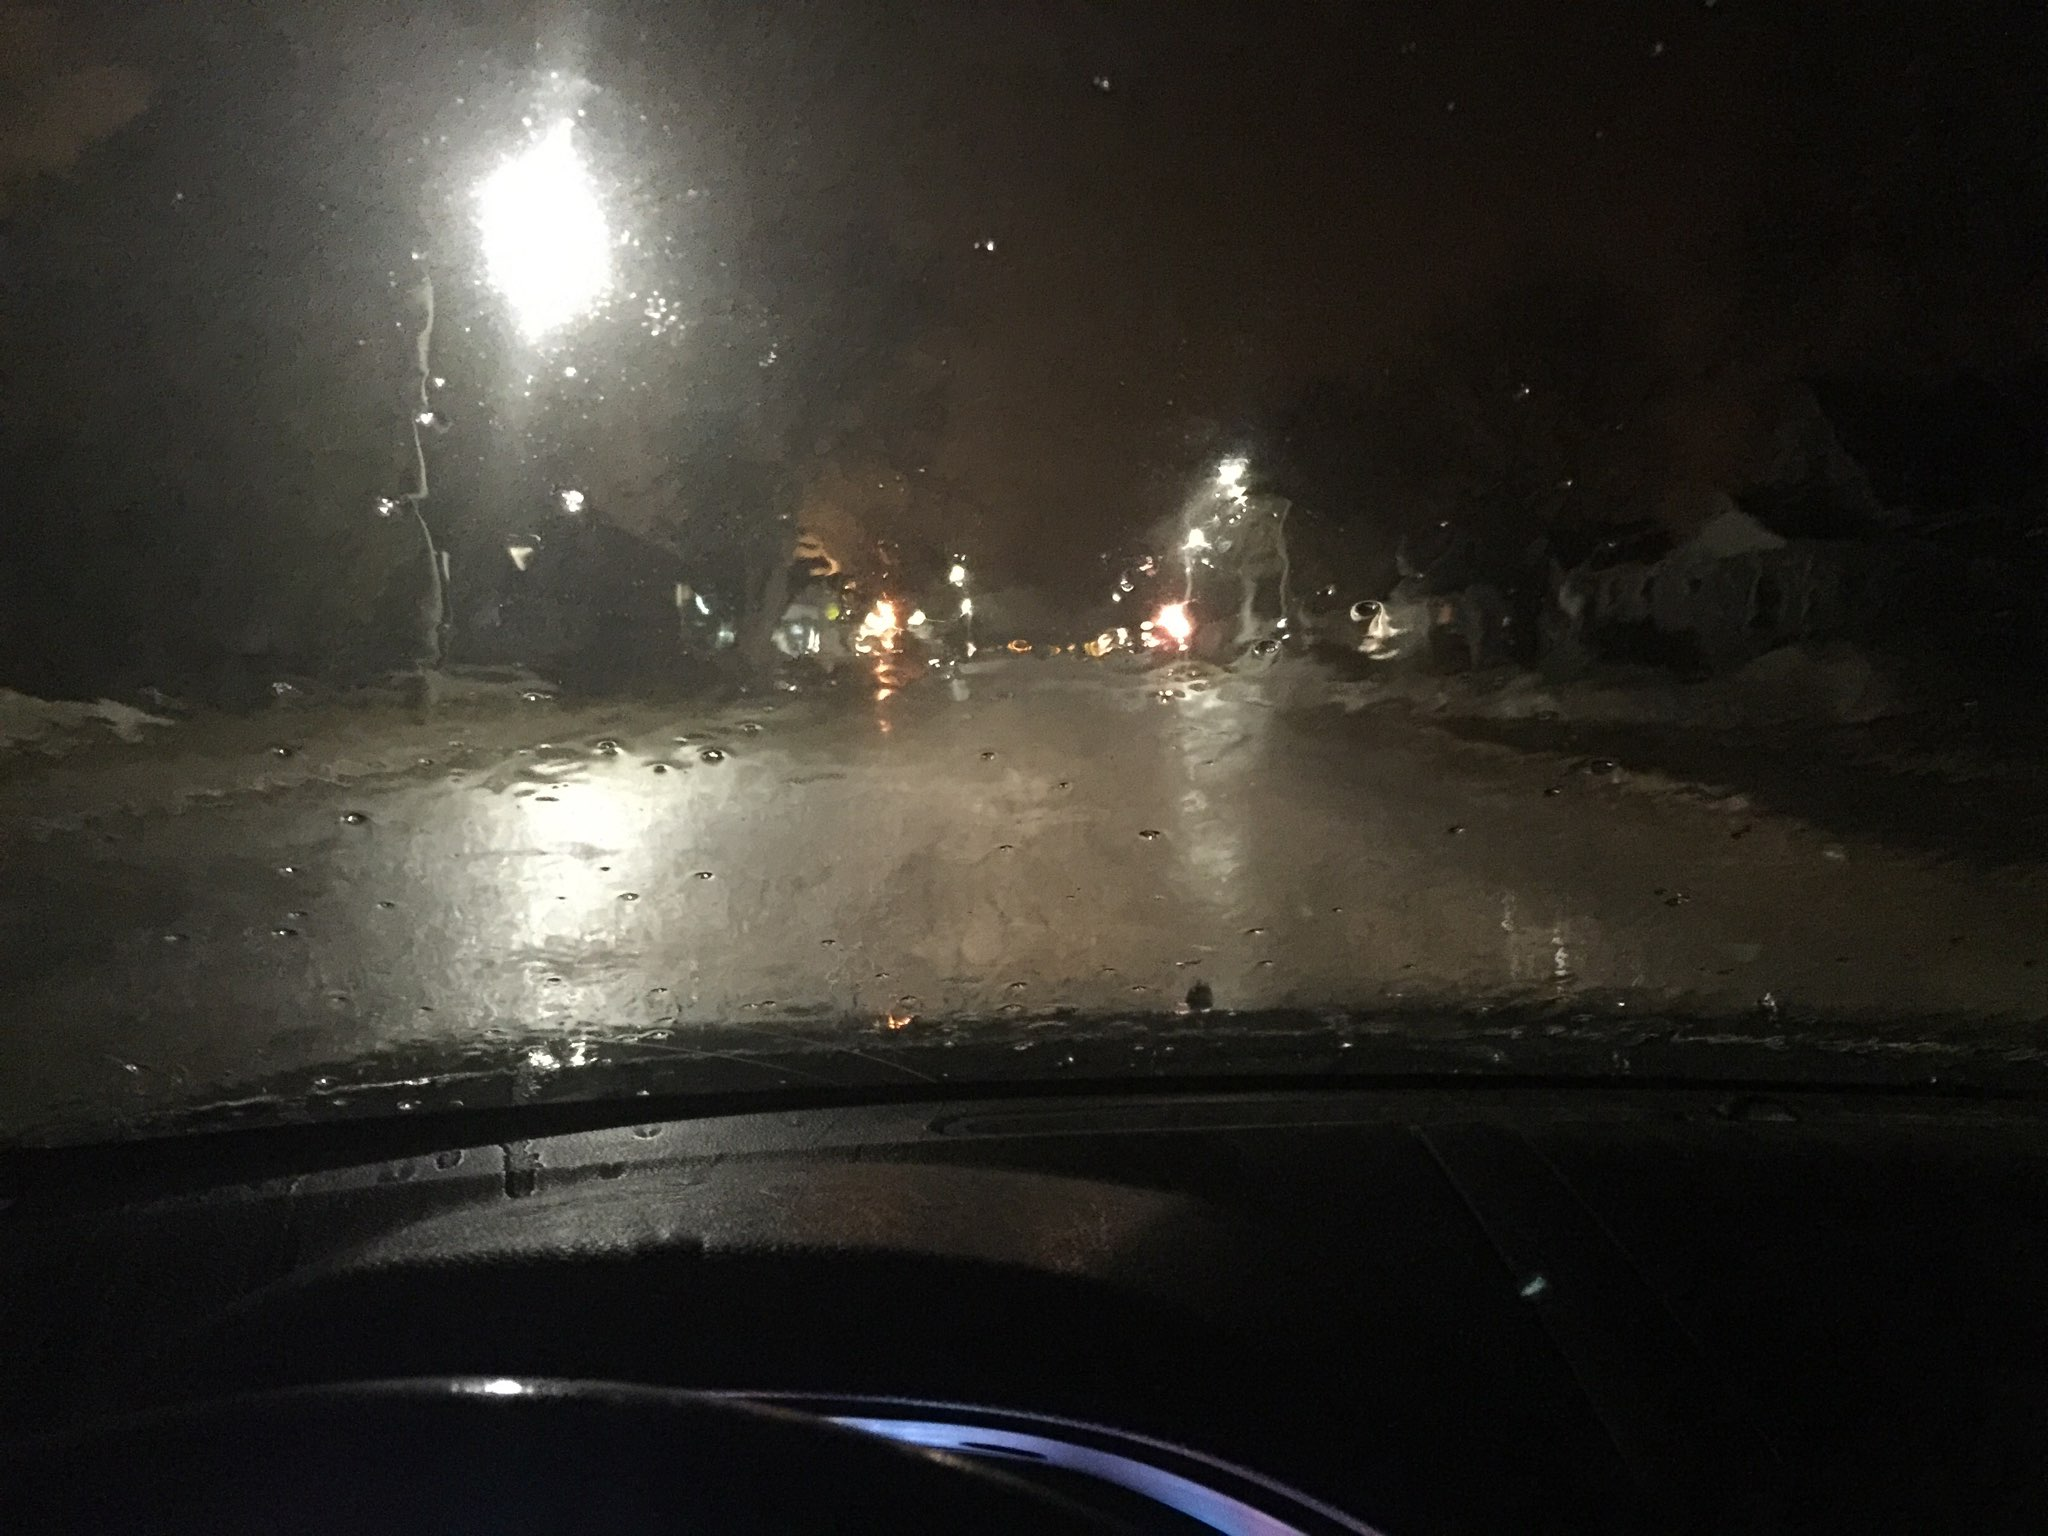 FREEZING RAIN WARNING / HEAVY RAIN